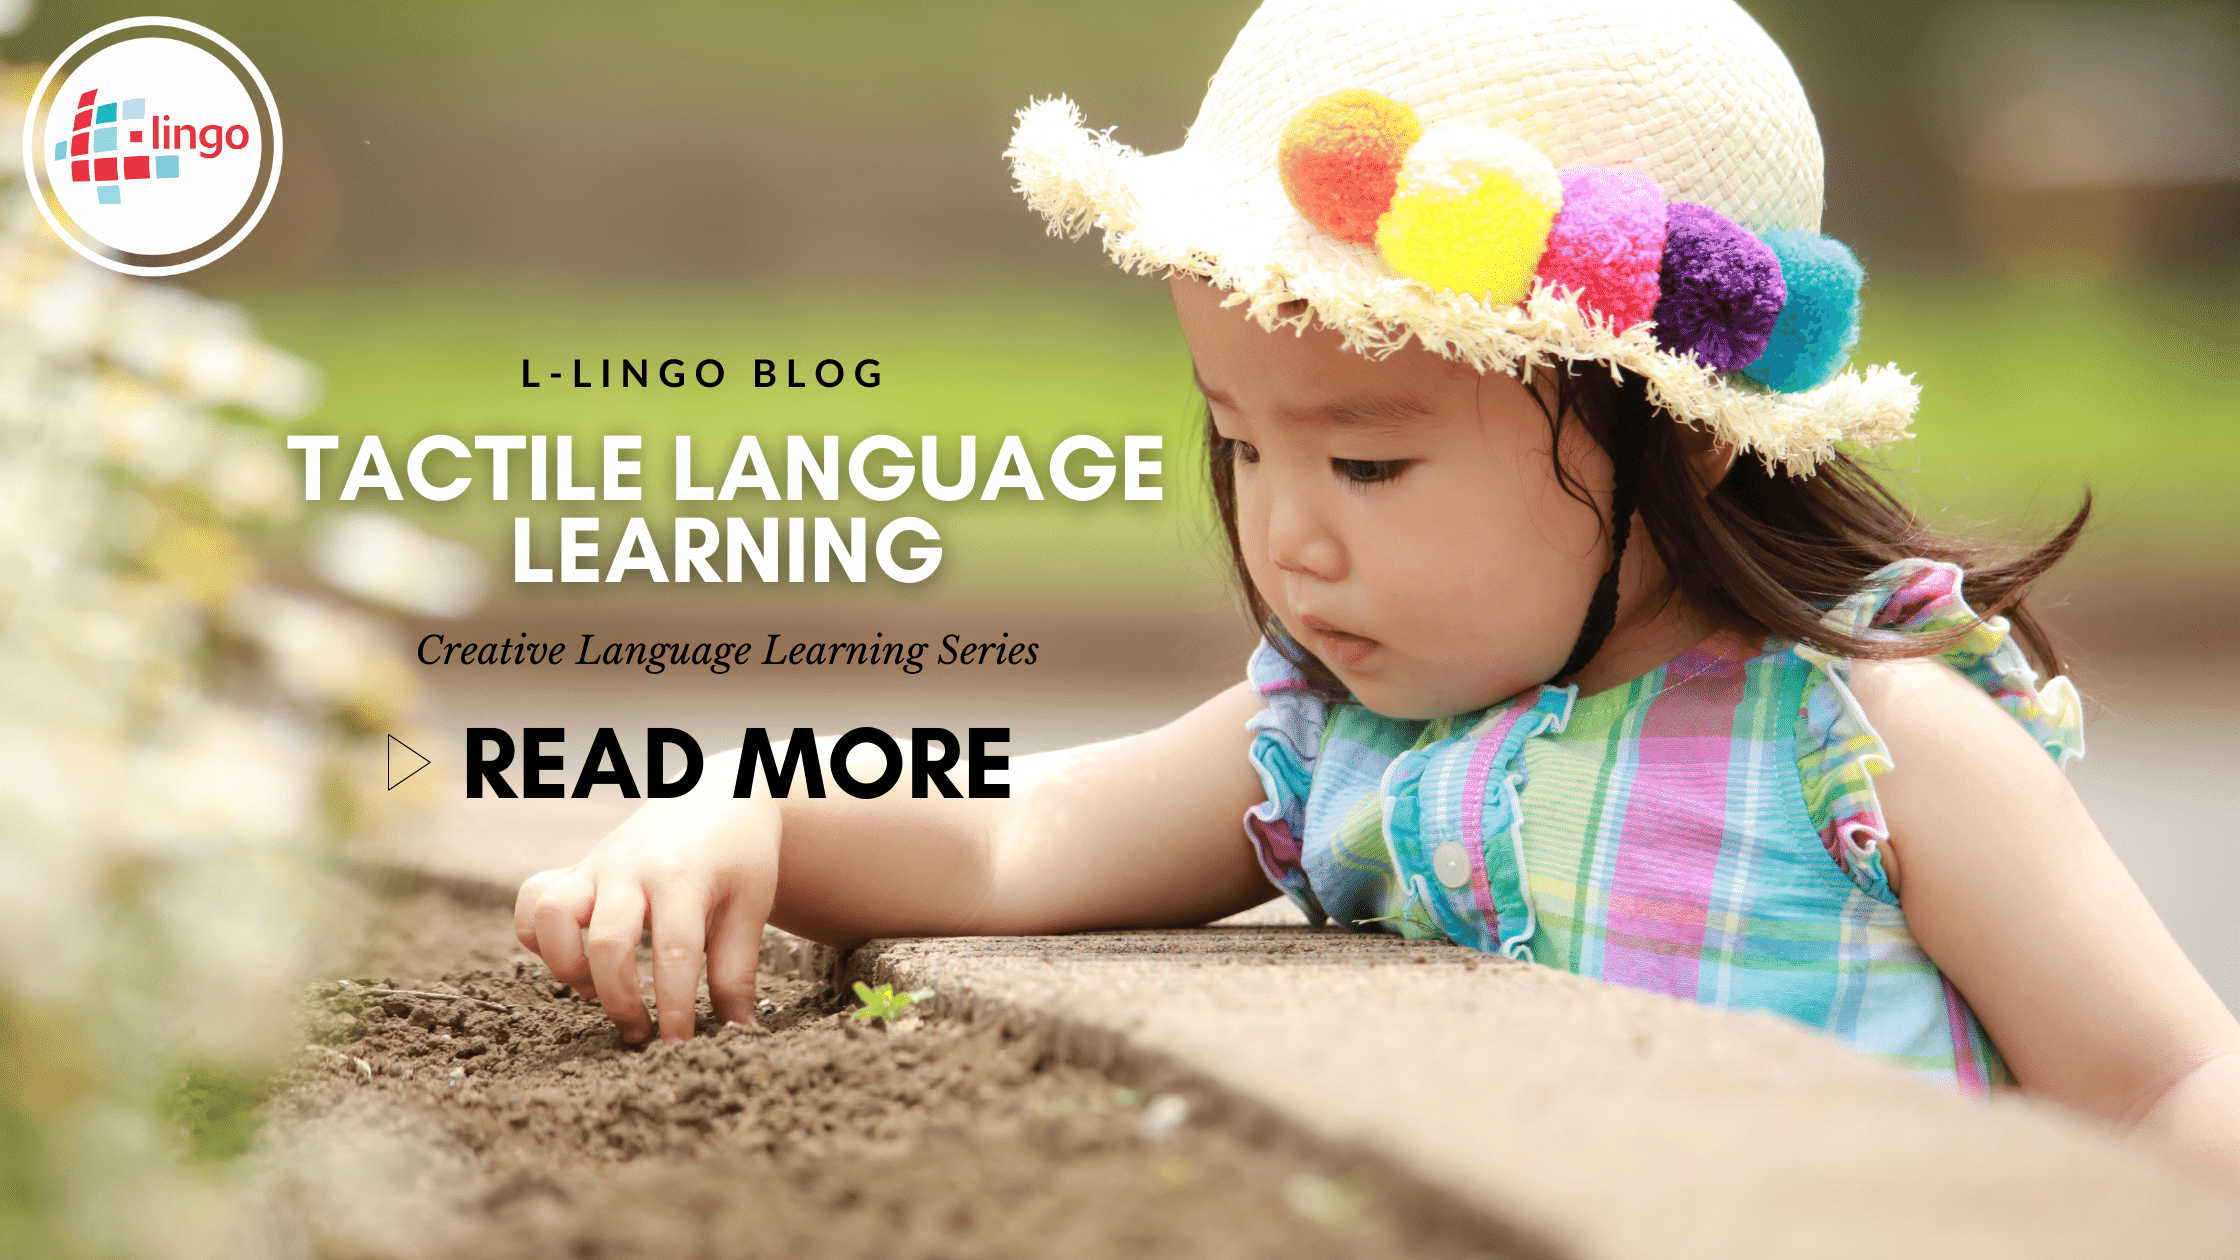 L-Lingo Blog Tactile Language Learning